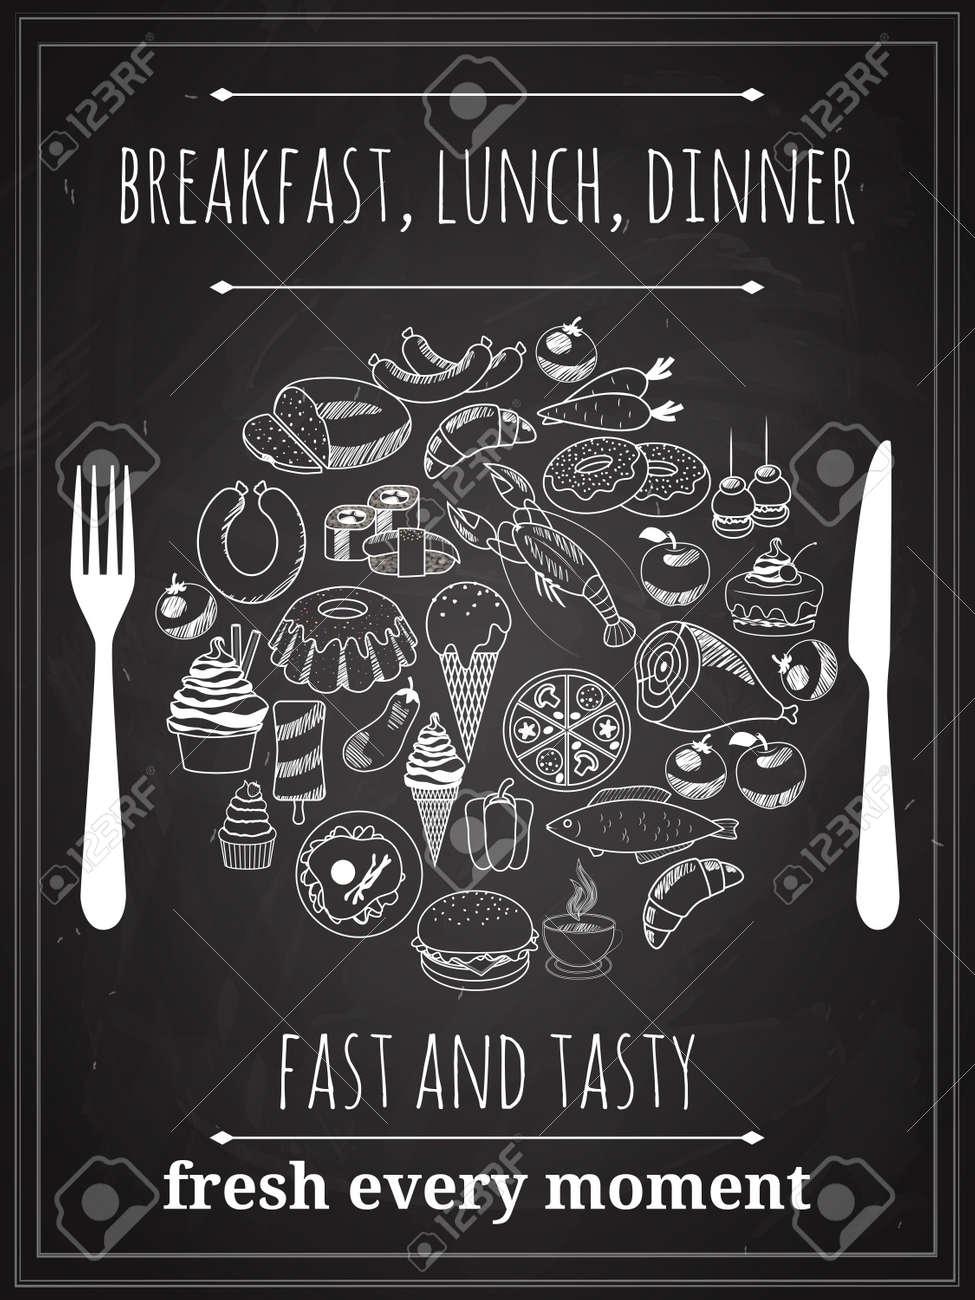 Vector Vintage Breakfast, Lunch or Dinner Poster Background - 166779365